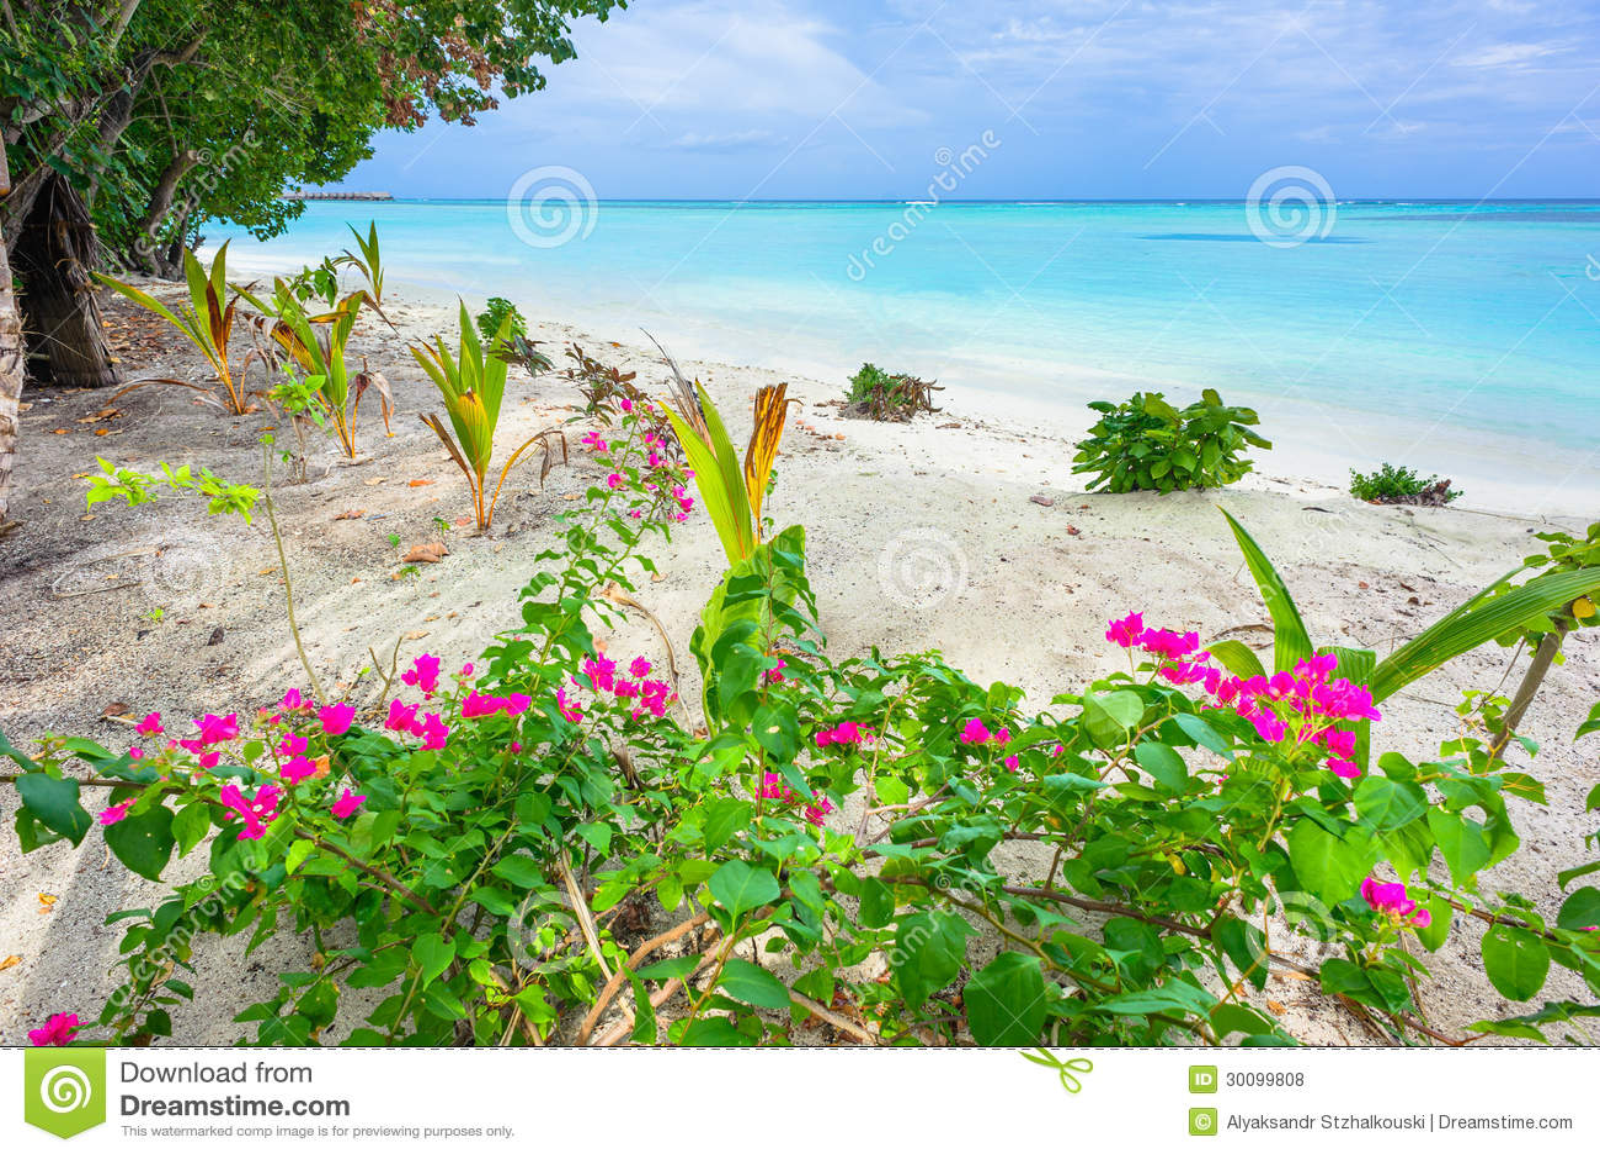 Tropical Island Flowers: Tropical Island Royalty Free Stock Photos